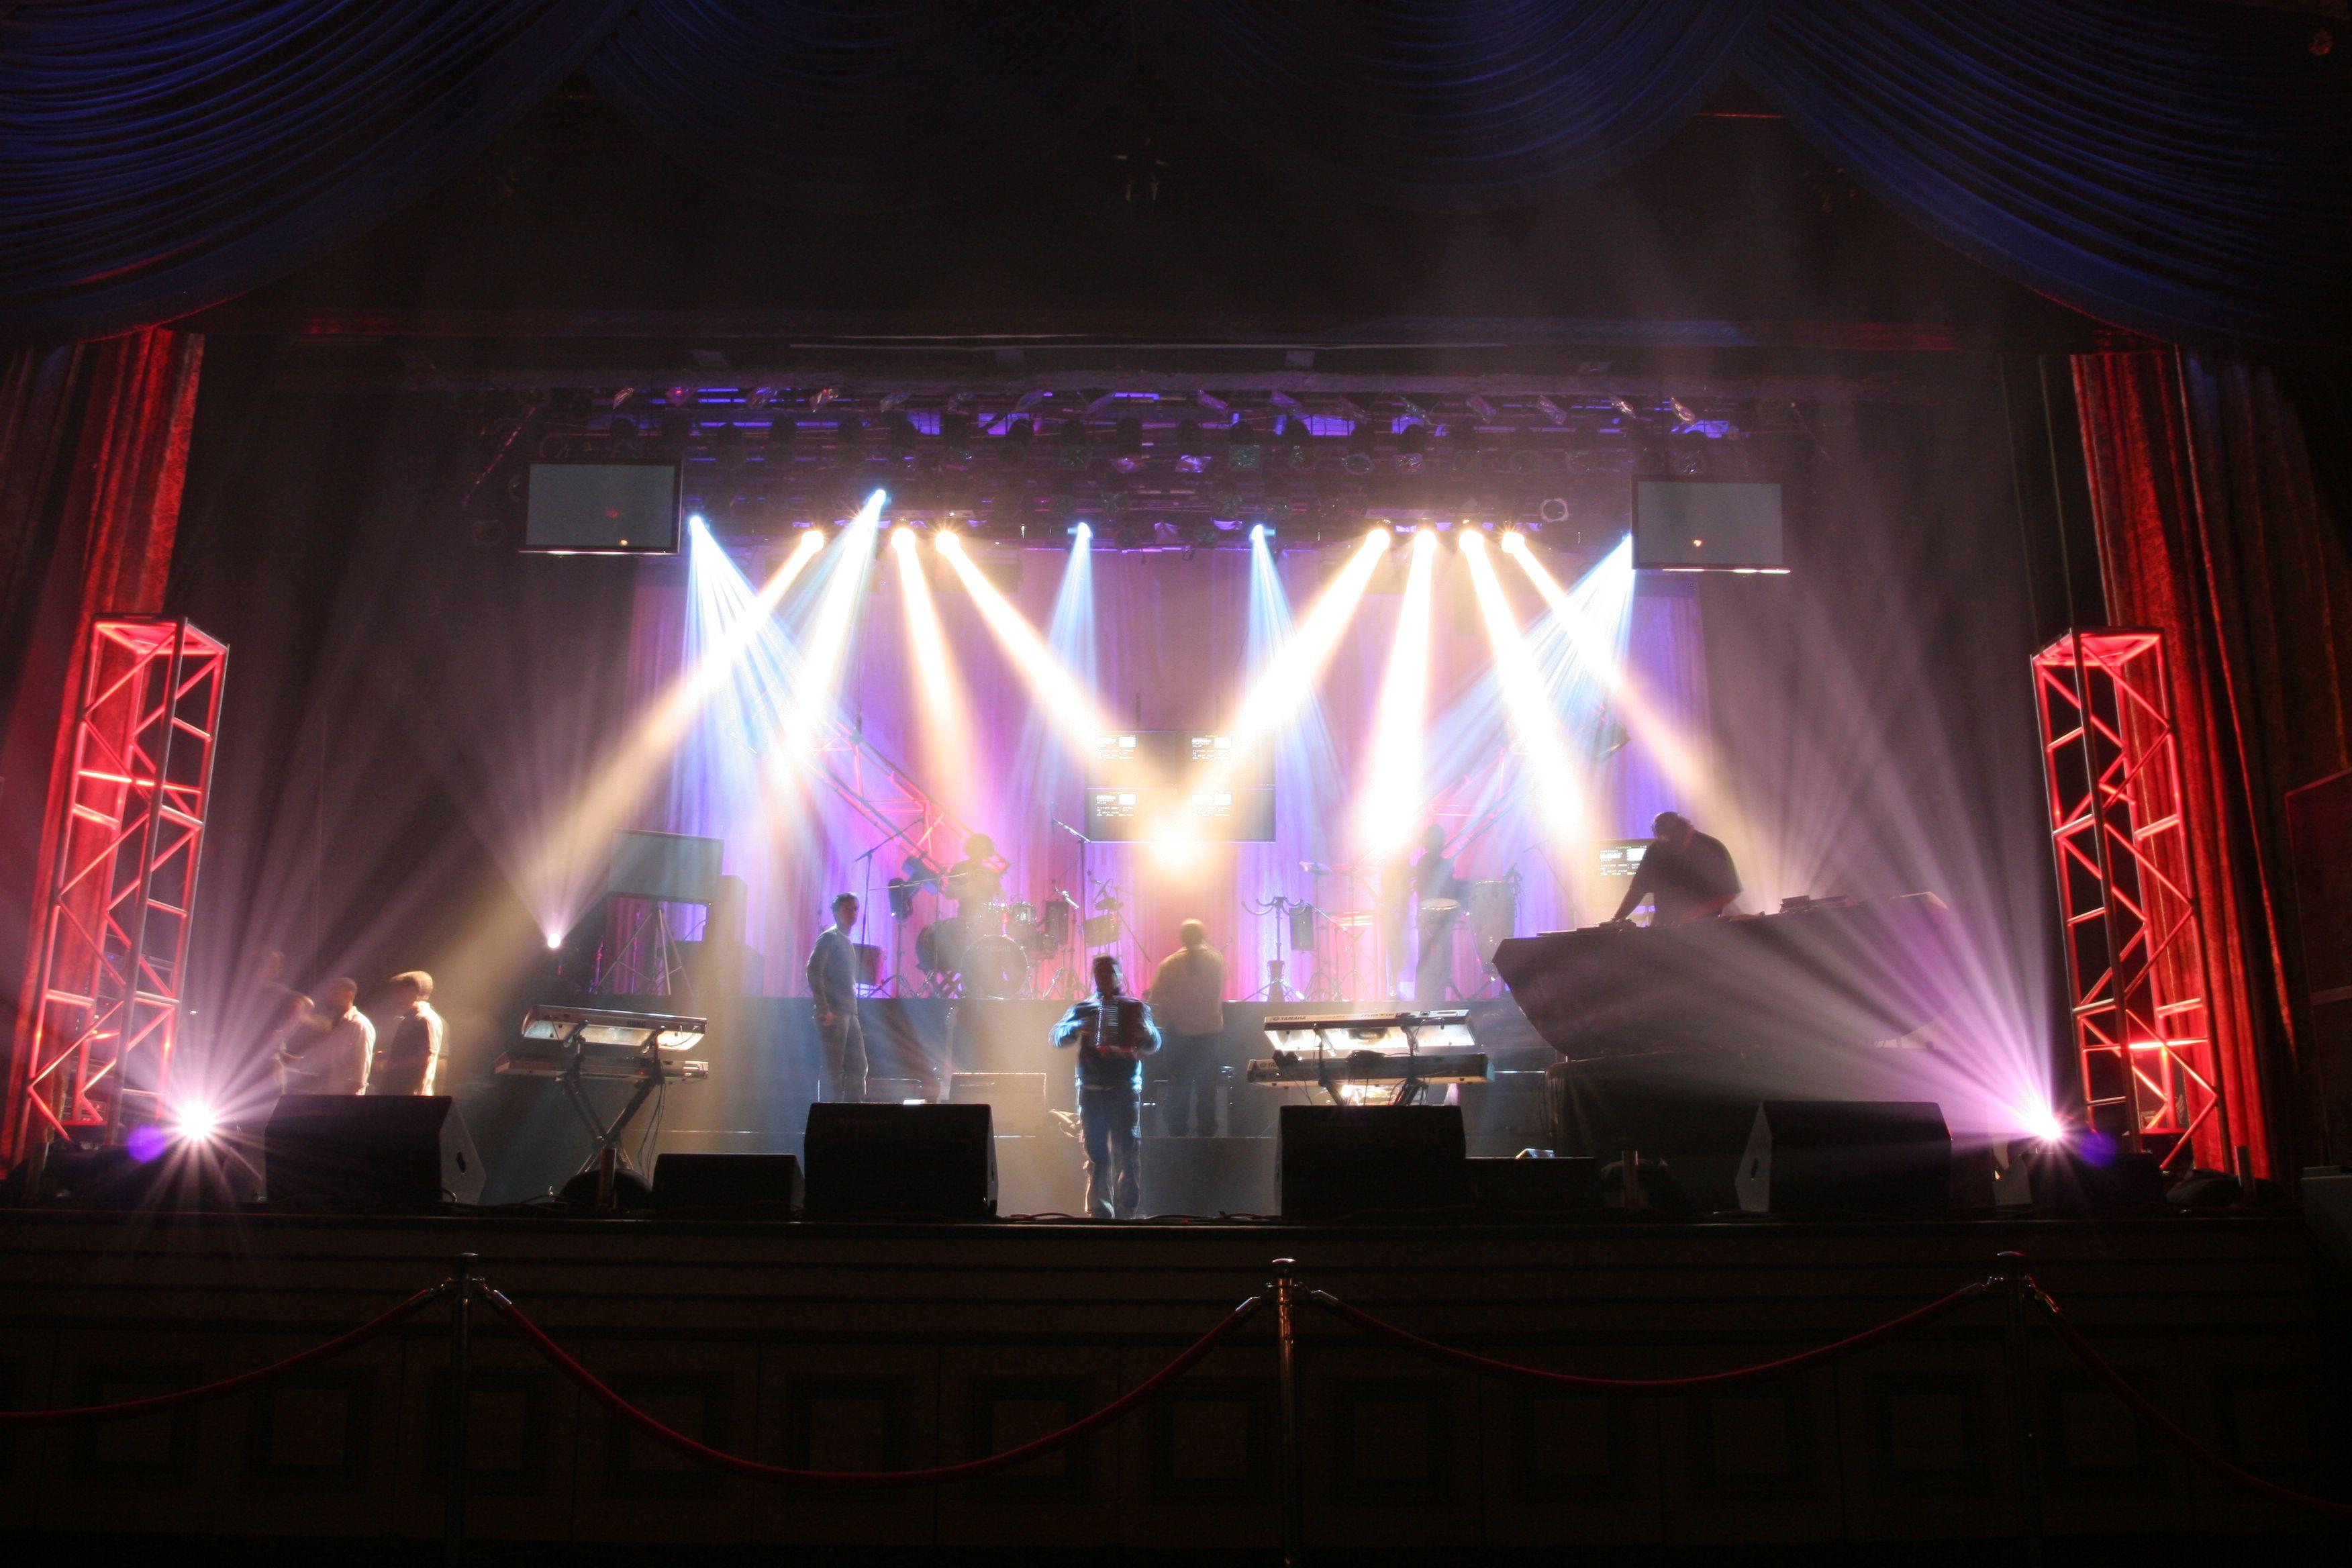 Concert Lighting Hammerstein Grand Ballroom Nyc Stage